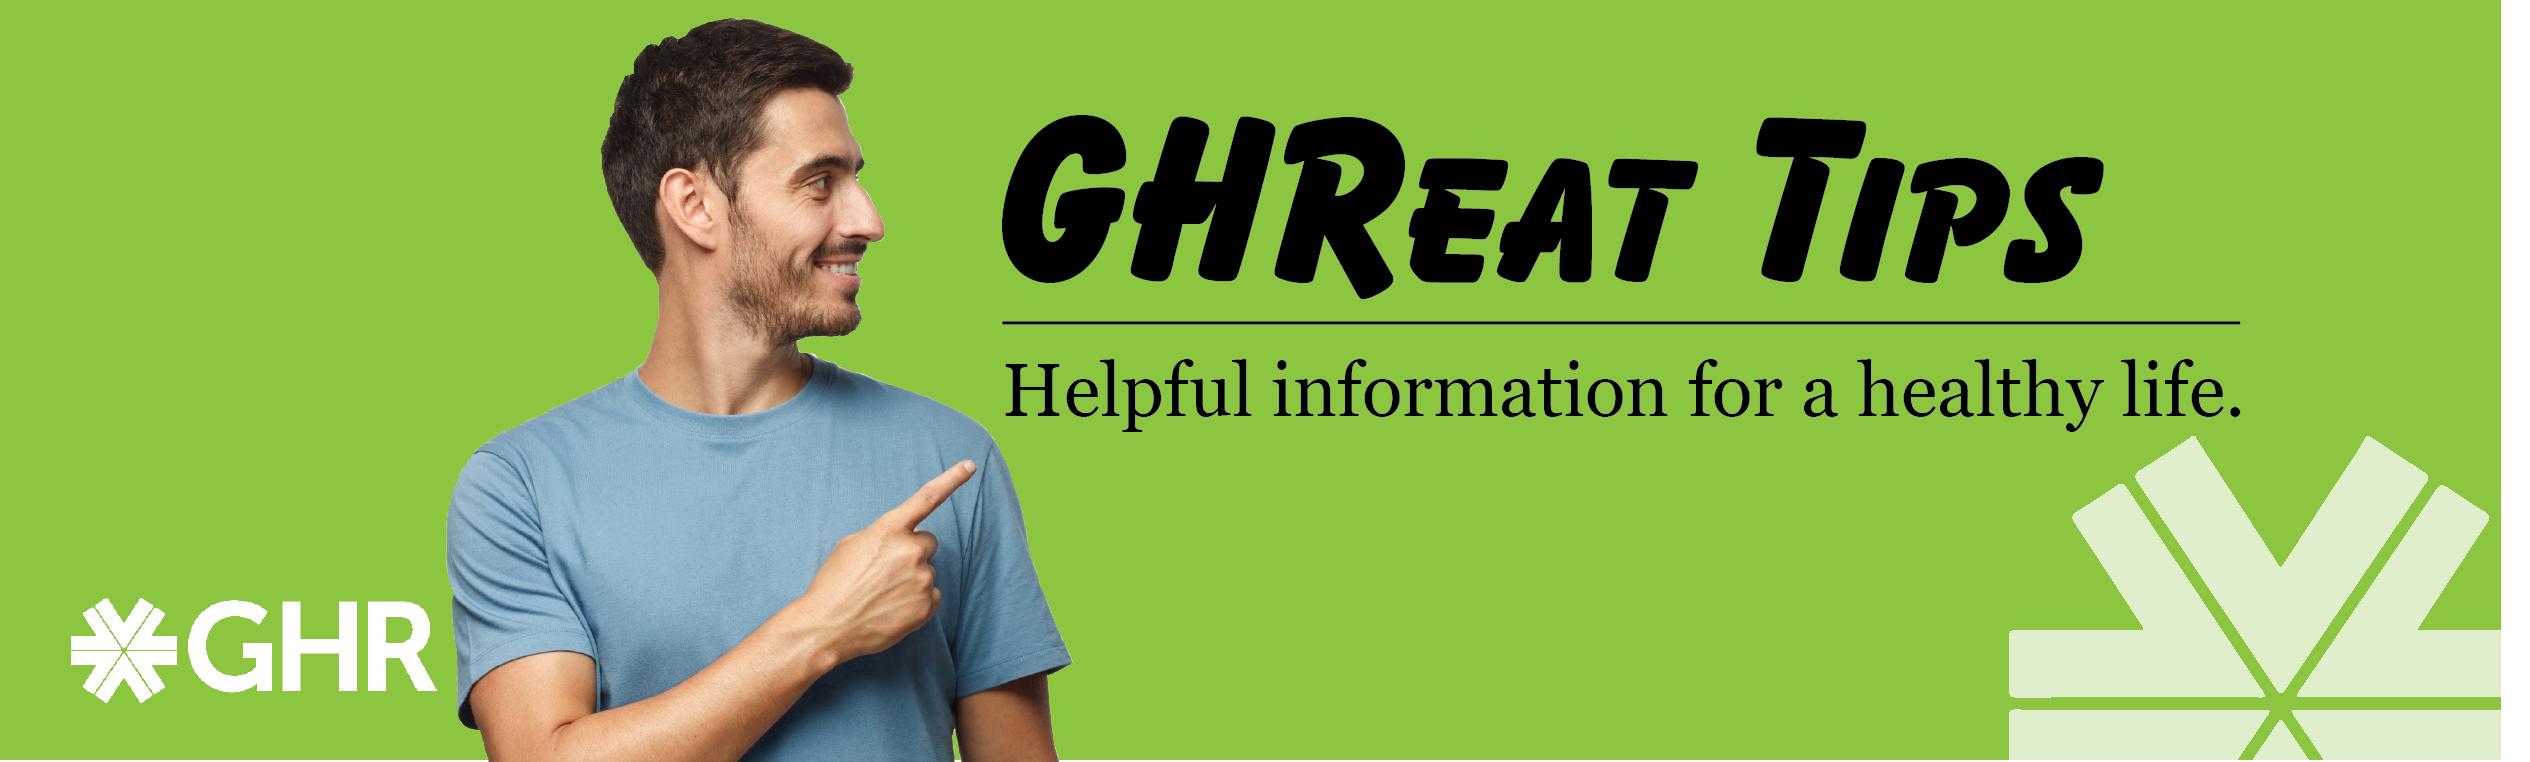 GHReat Tips Masthead 5